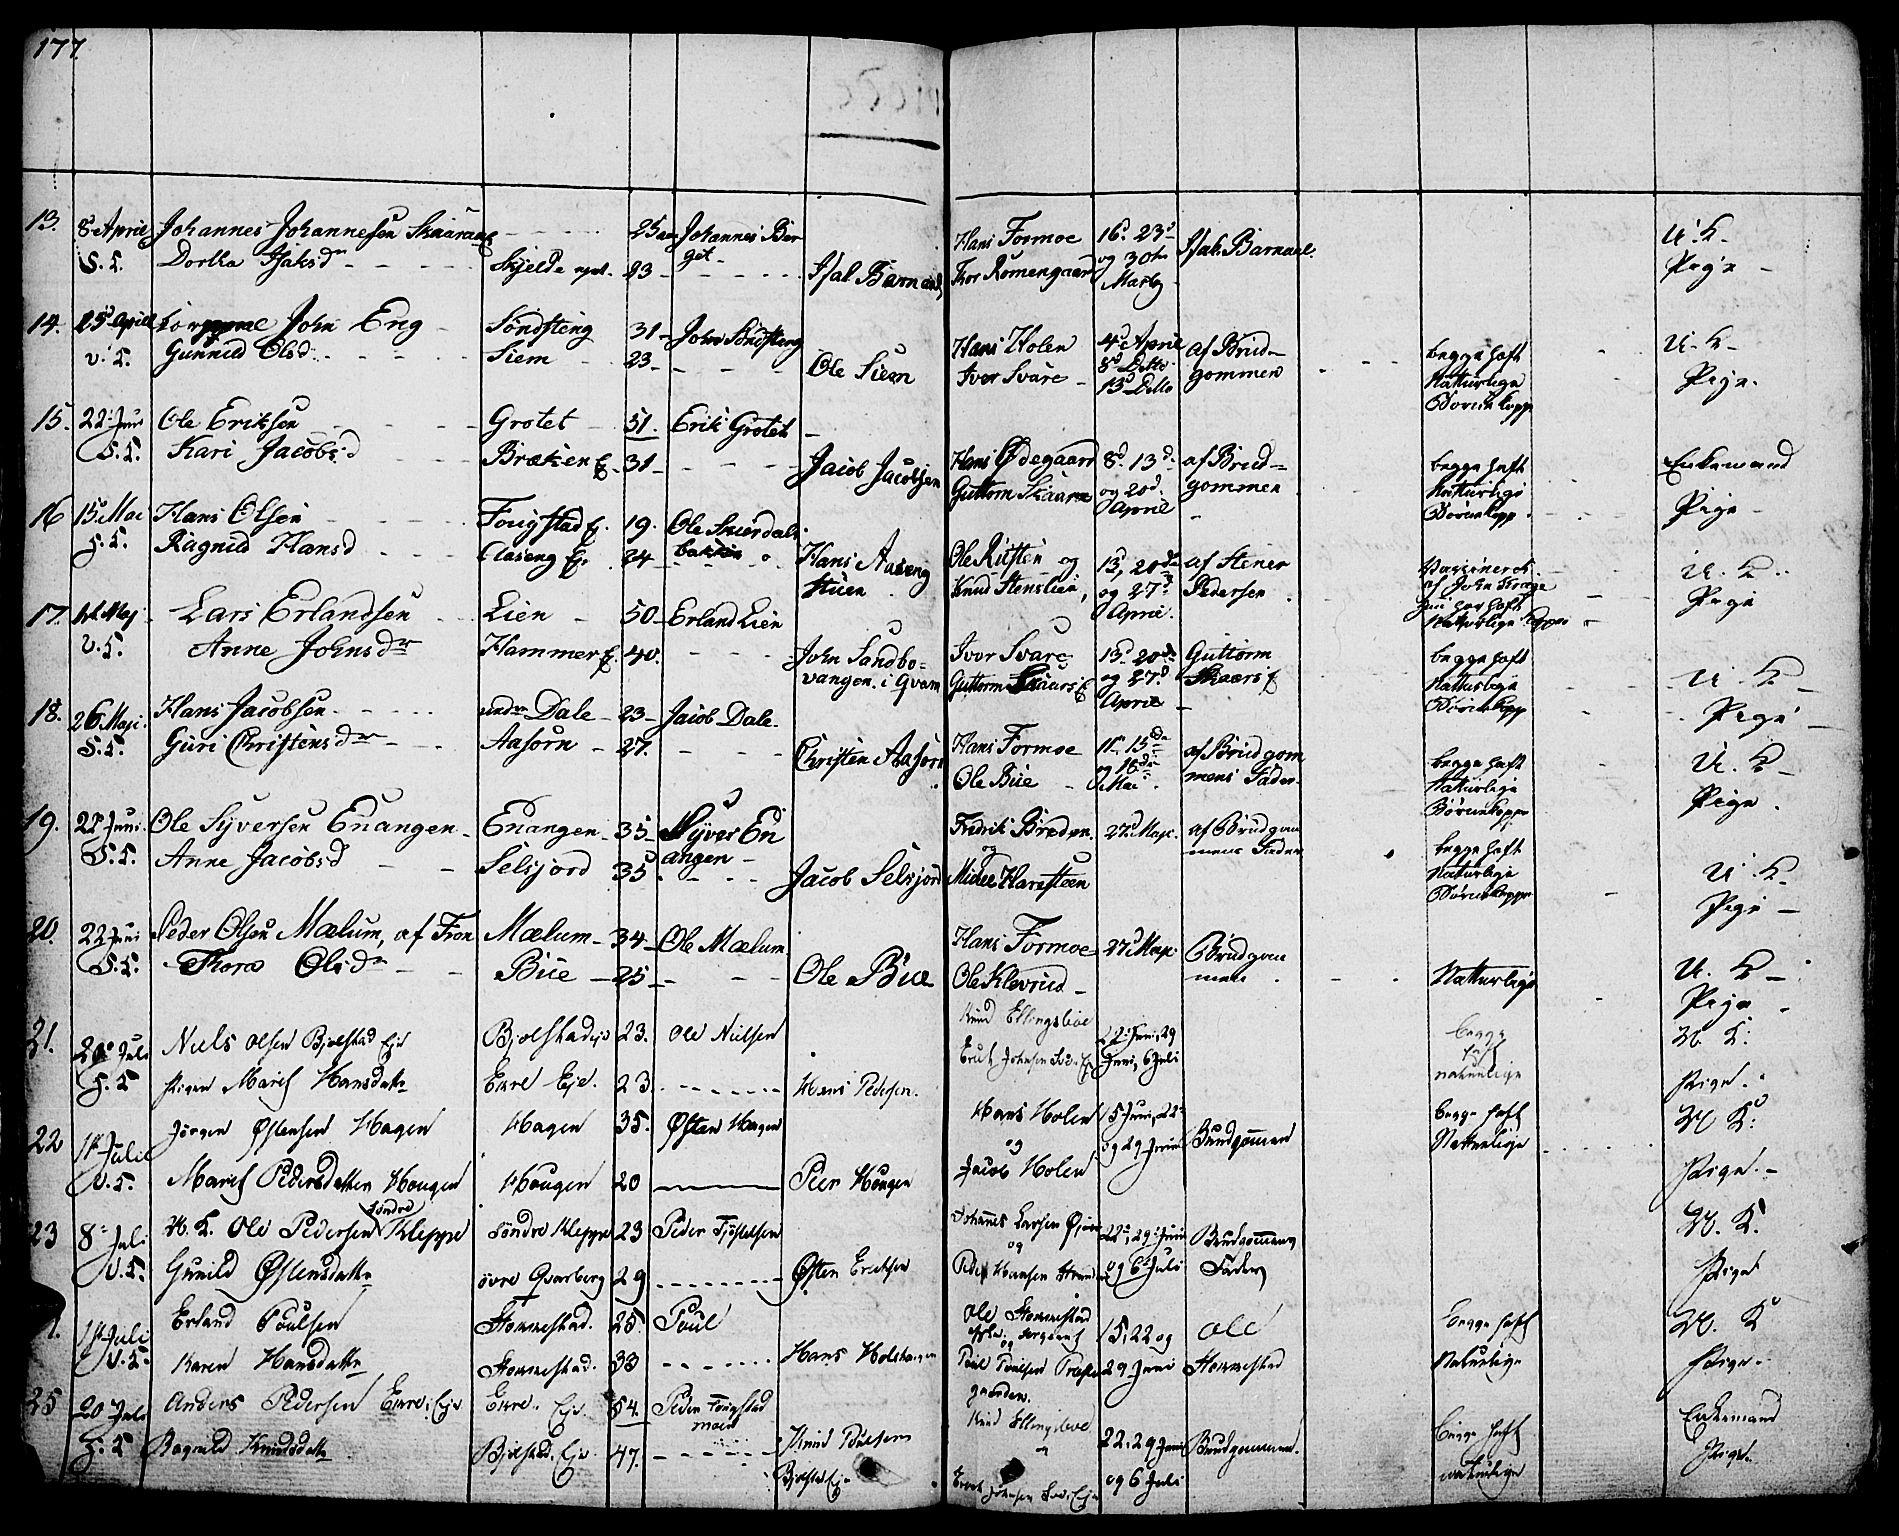 SAH, Vågå prestekontor, Ministerialbok nr. 4 /1, 1827-1842, s. 177